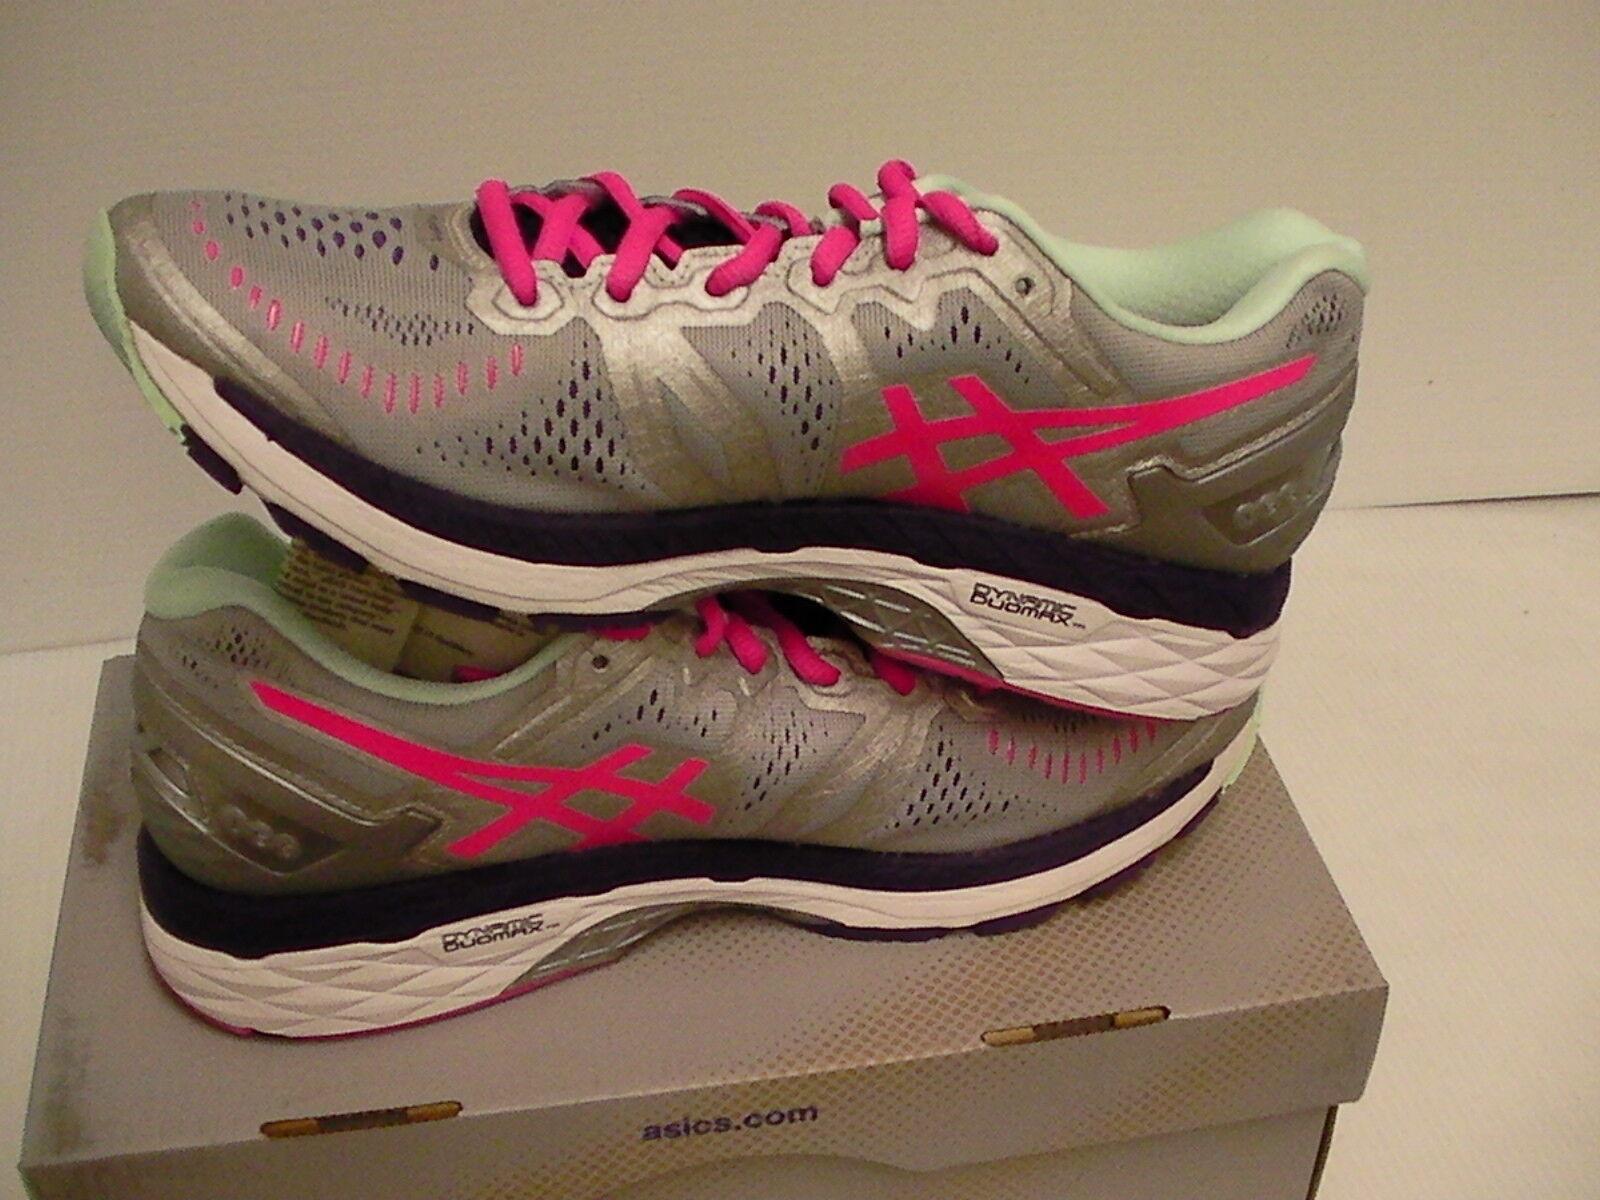 Asics Damens's gel kayano 23 running schuhe 7 silver pink glow Größe 7 schuhe us 662c82